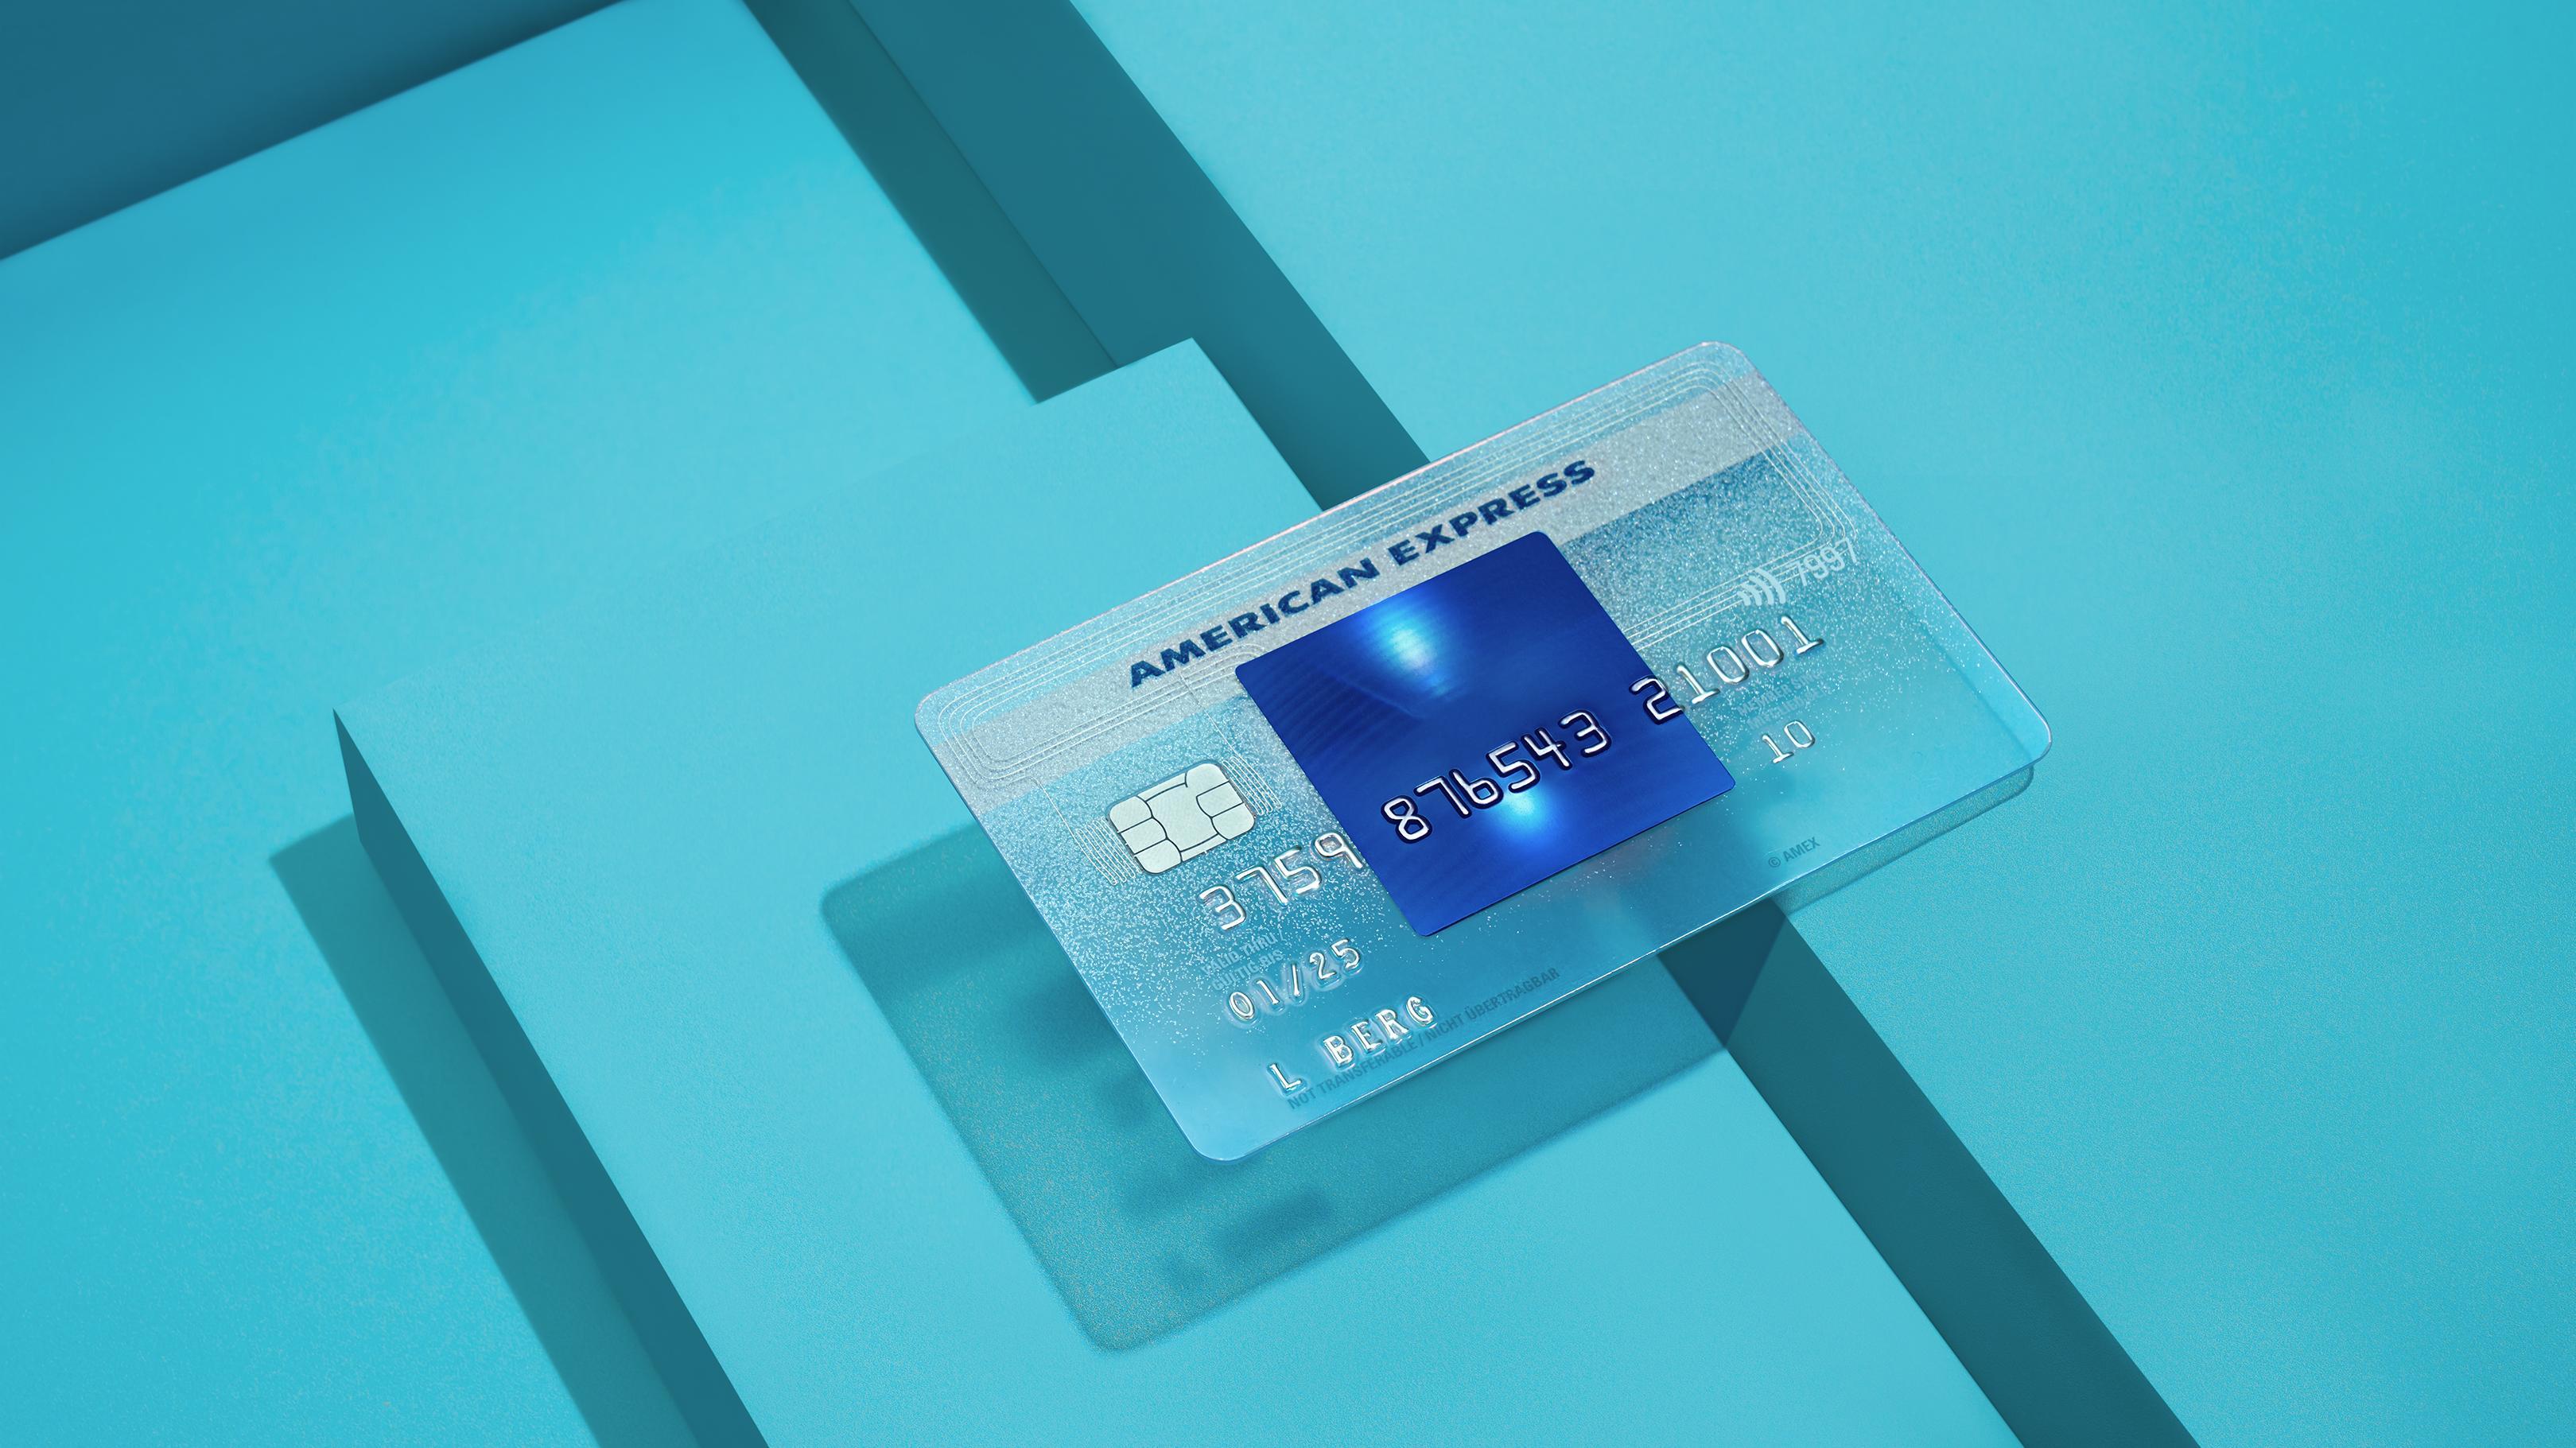 American Express Karte aktivieren: So geht's